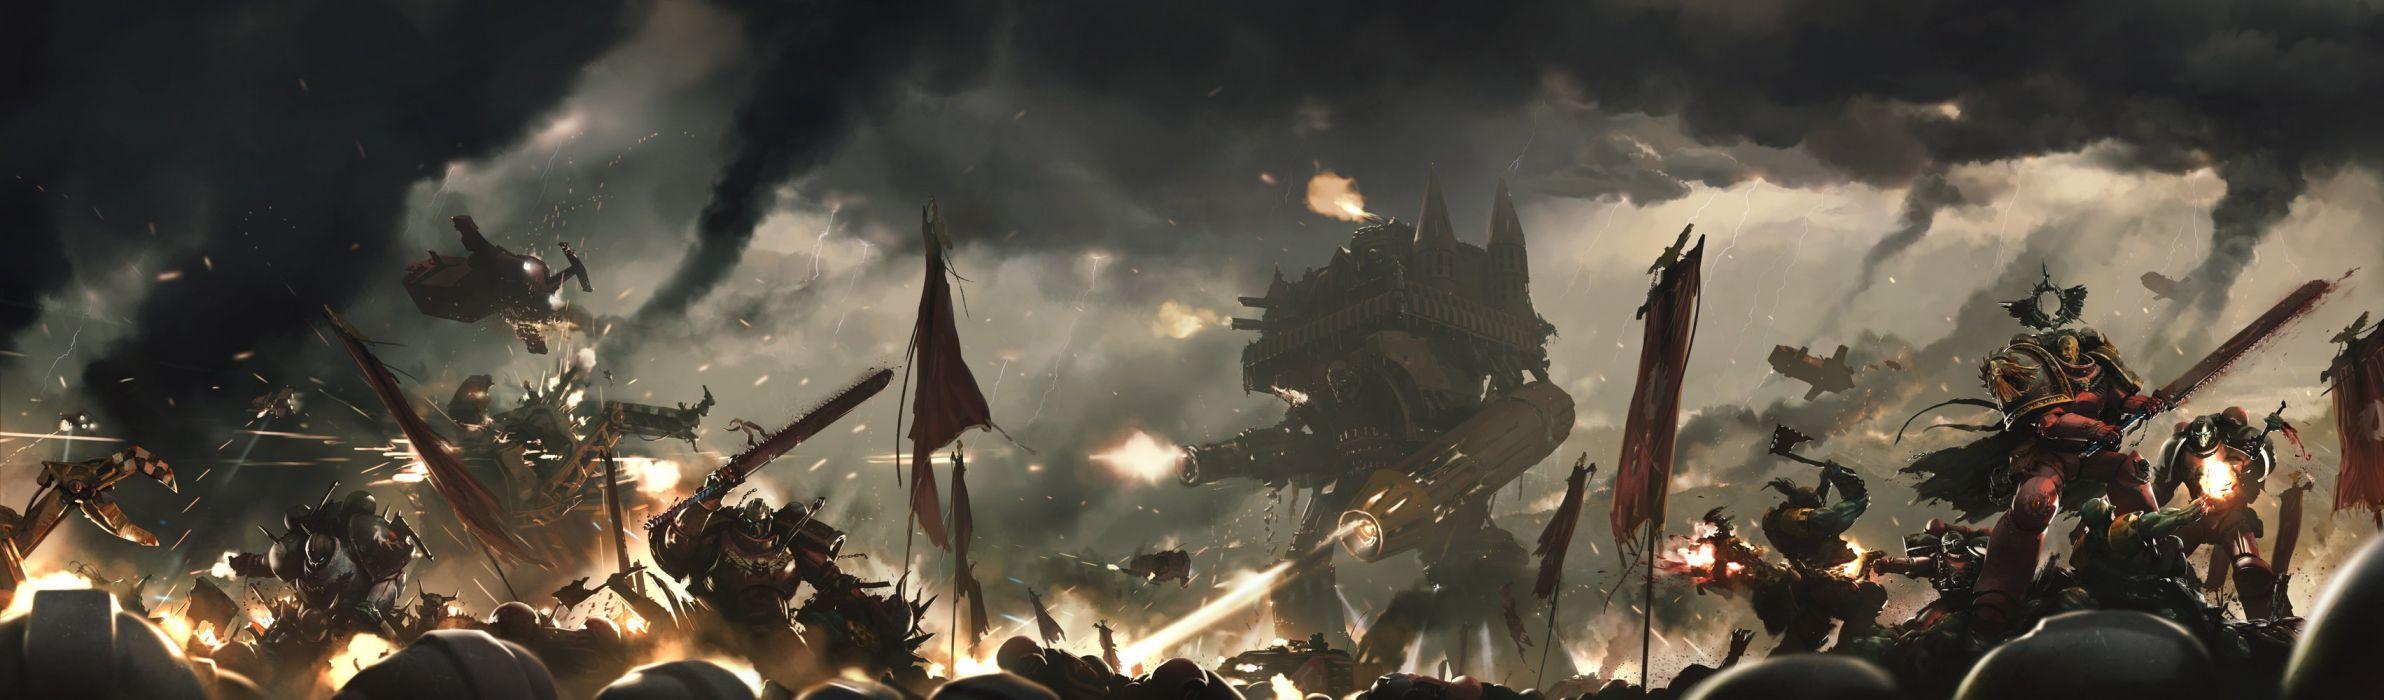 Warhammer 40k Space Marines wallpaper